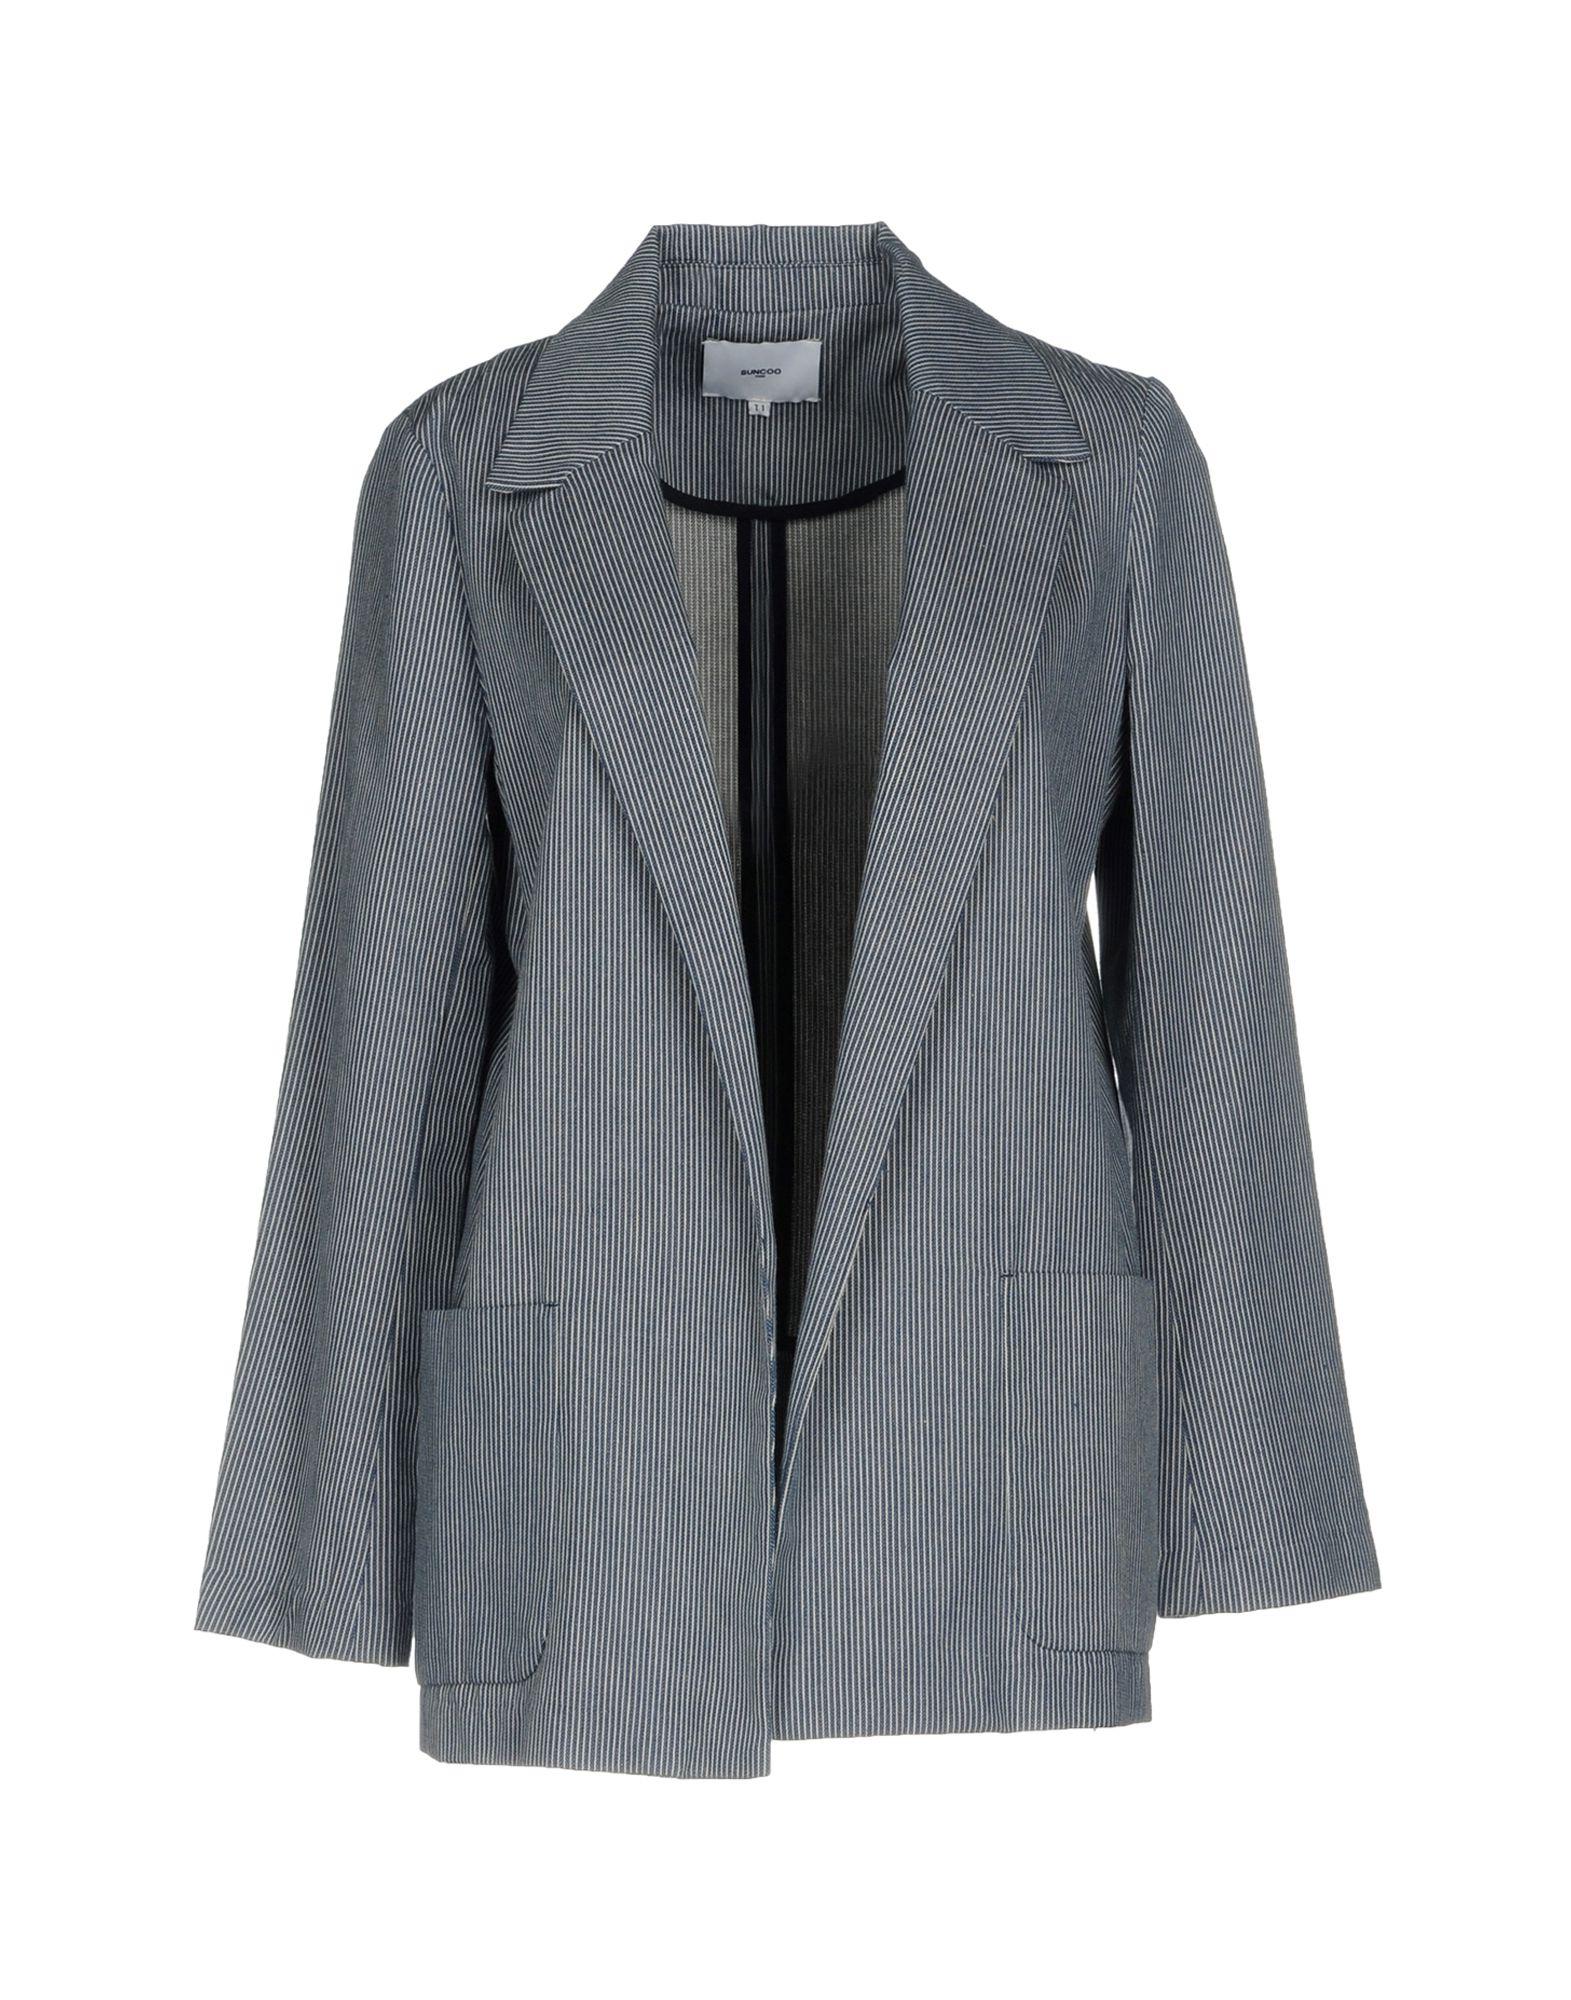 SUNCOO Blazer in Slate Blue